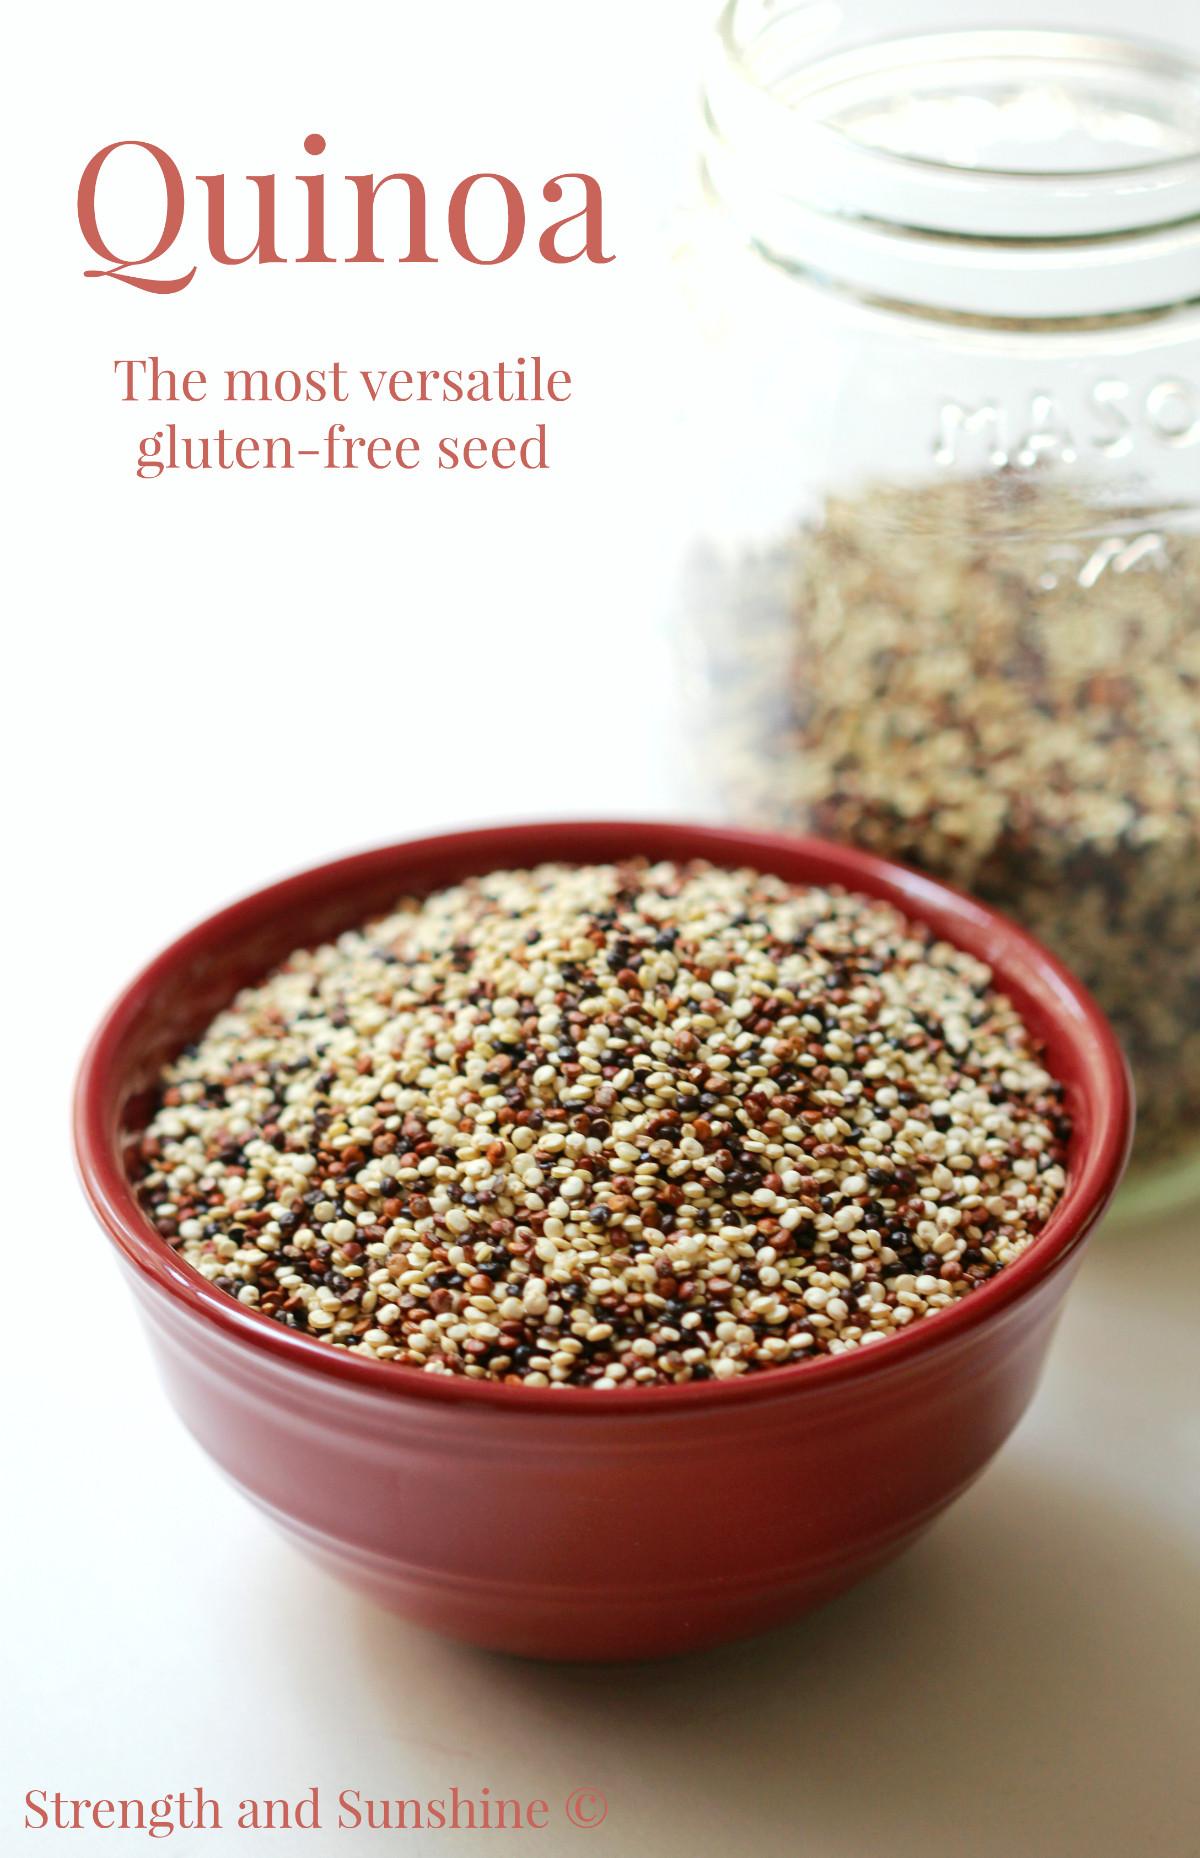 Quinoa Healthy Or Not  Quinoa The Most Versatile Gluten Free Seed